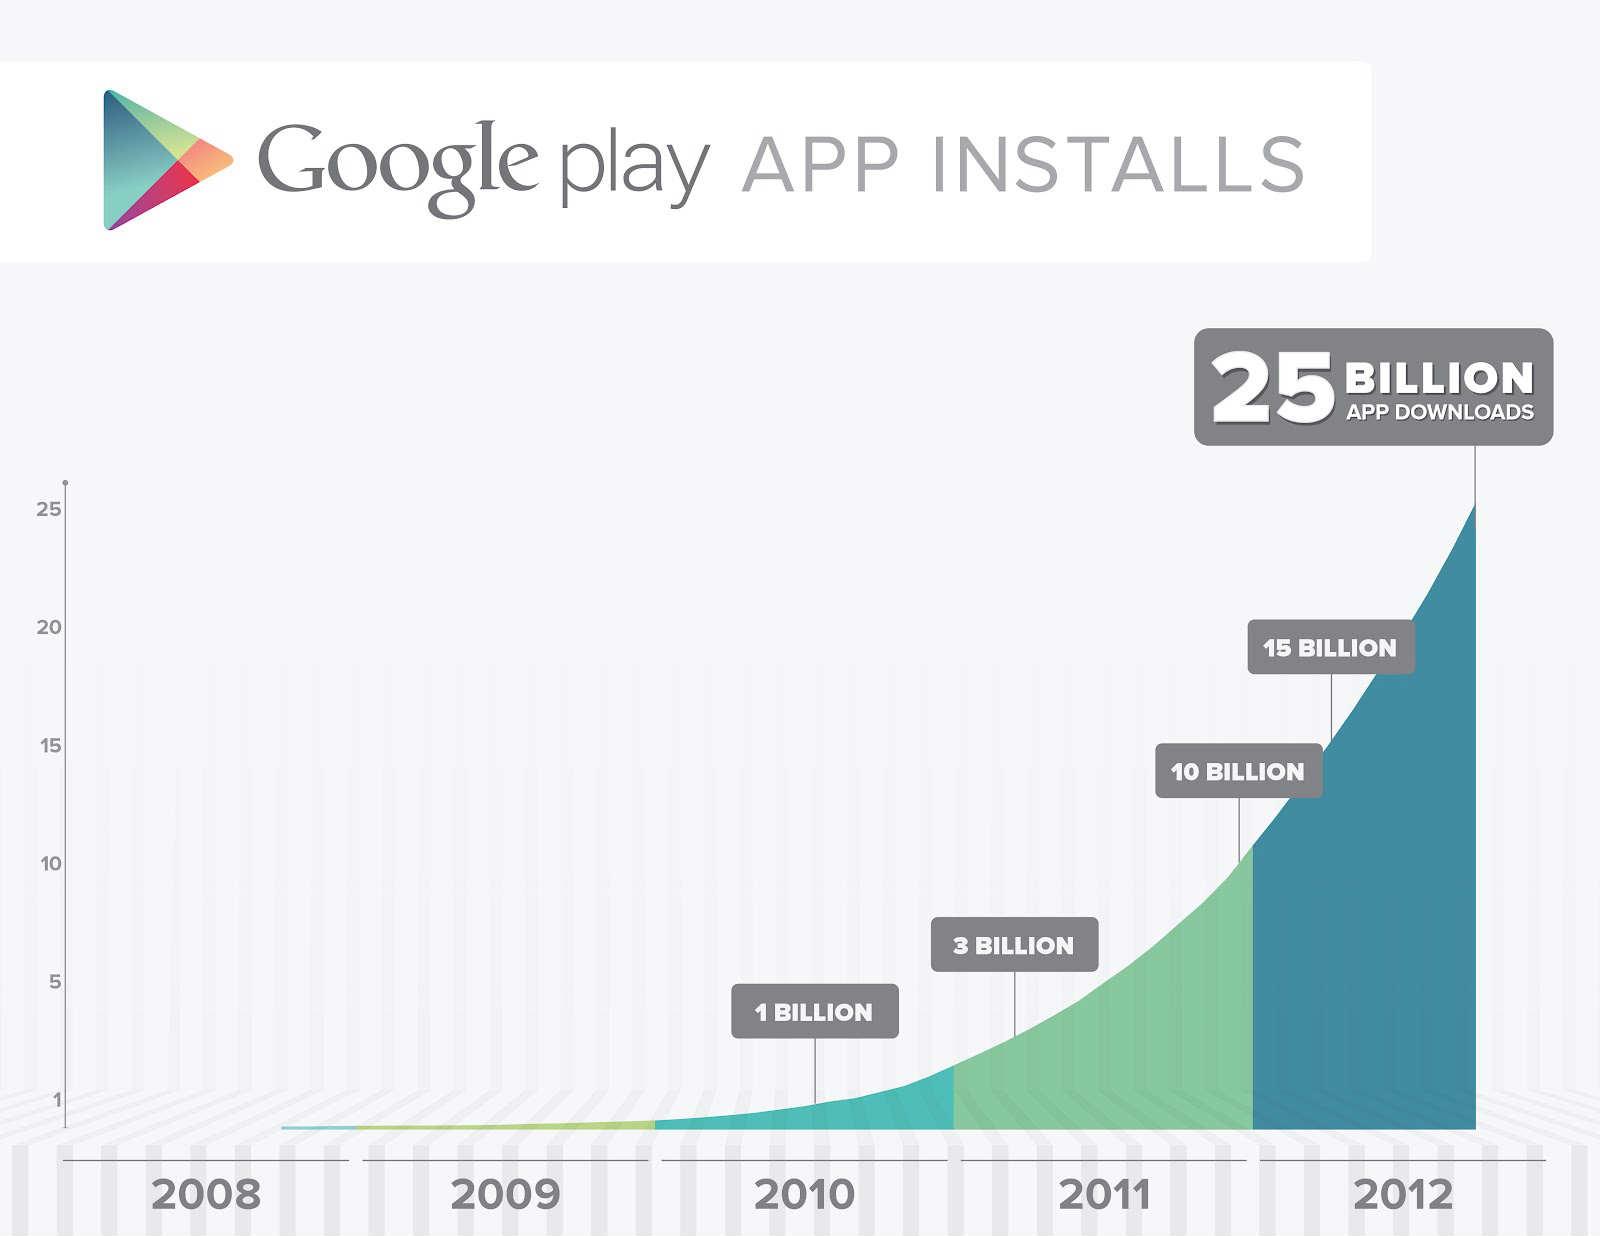 Google Play hits 25 billion downloads